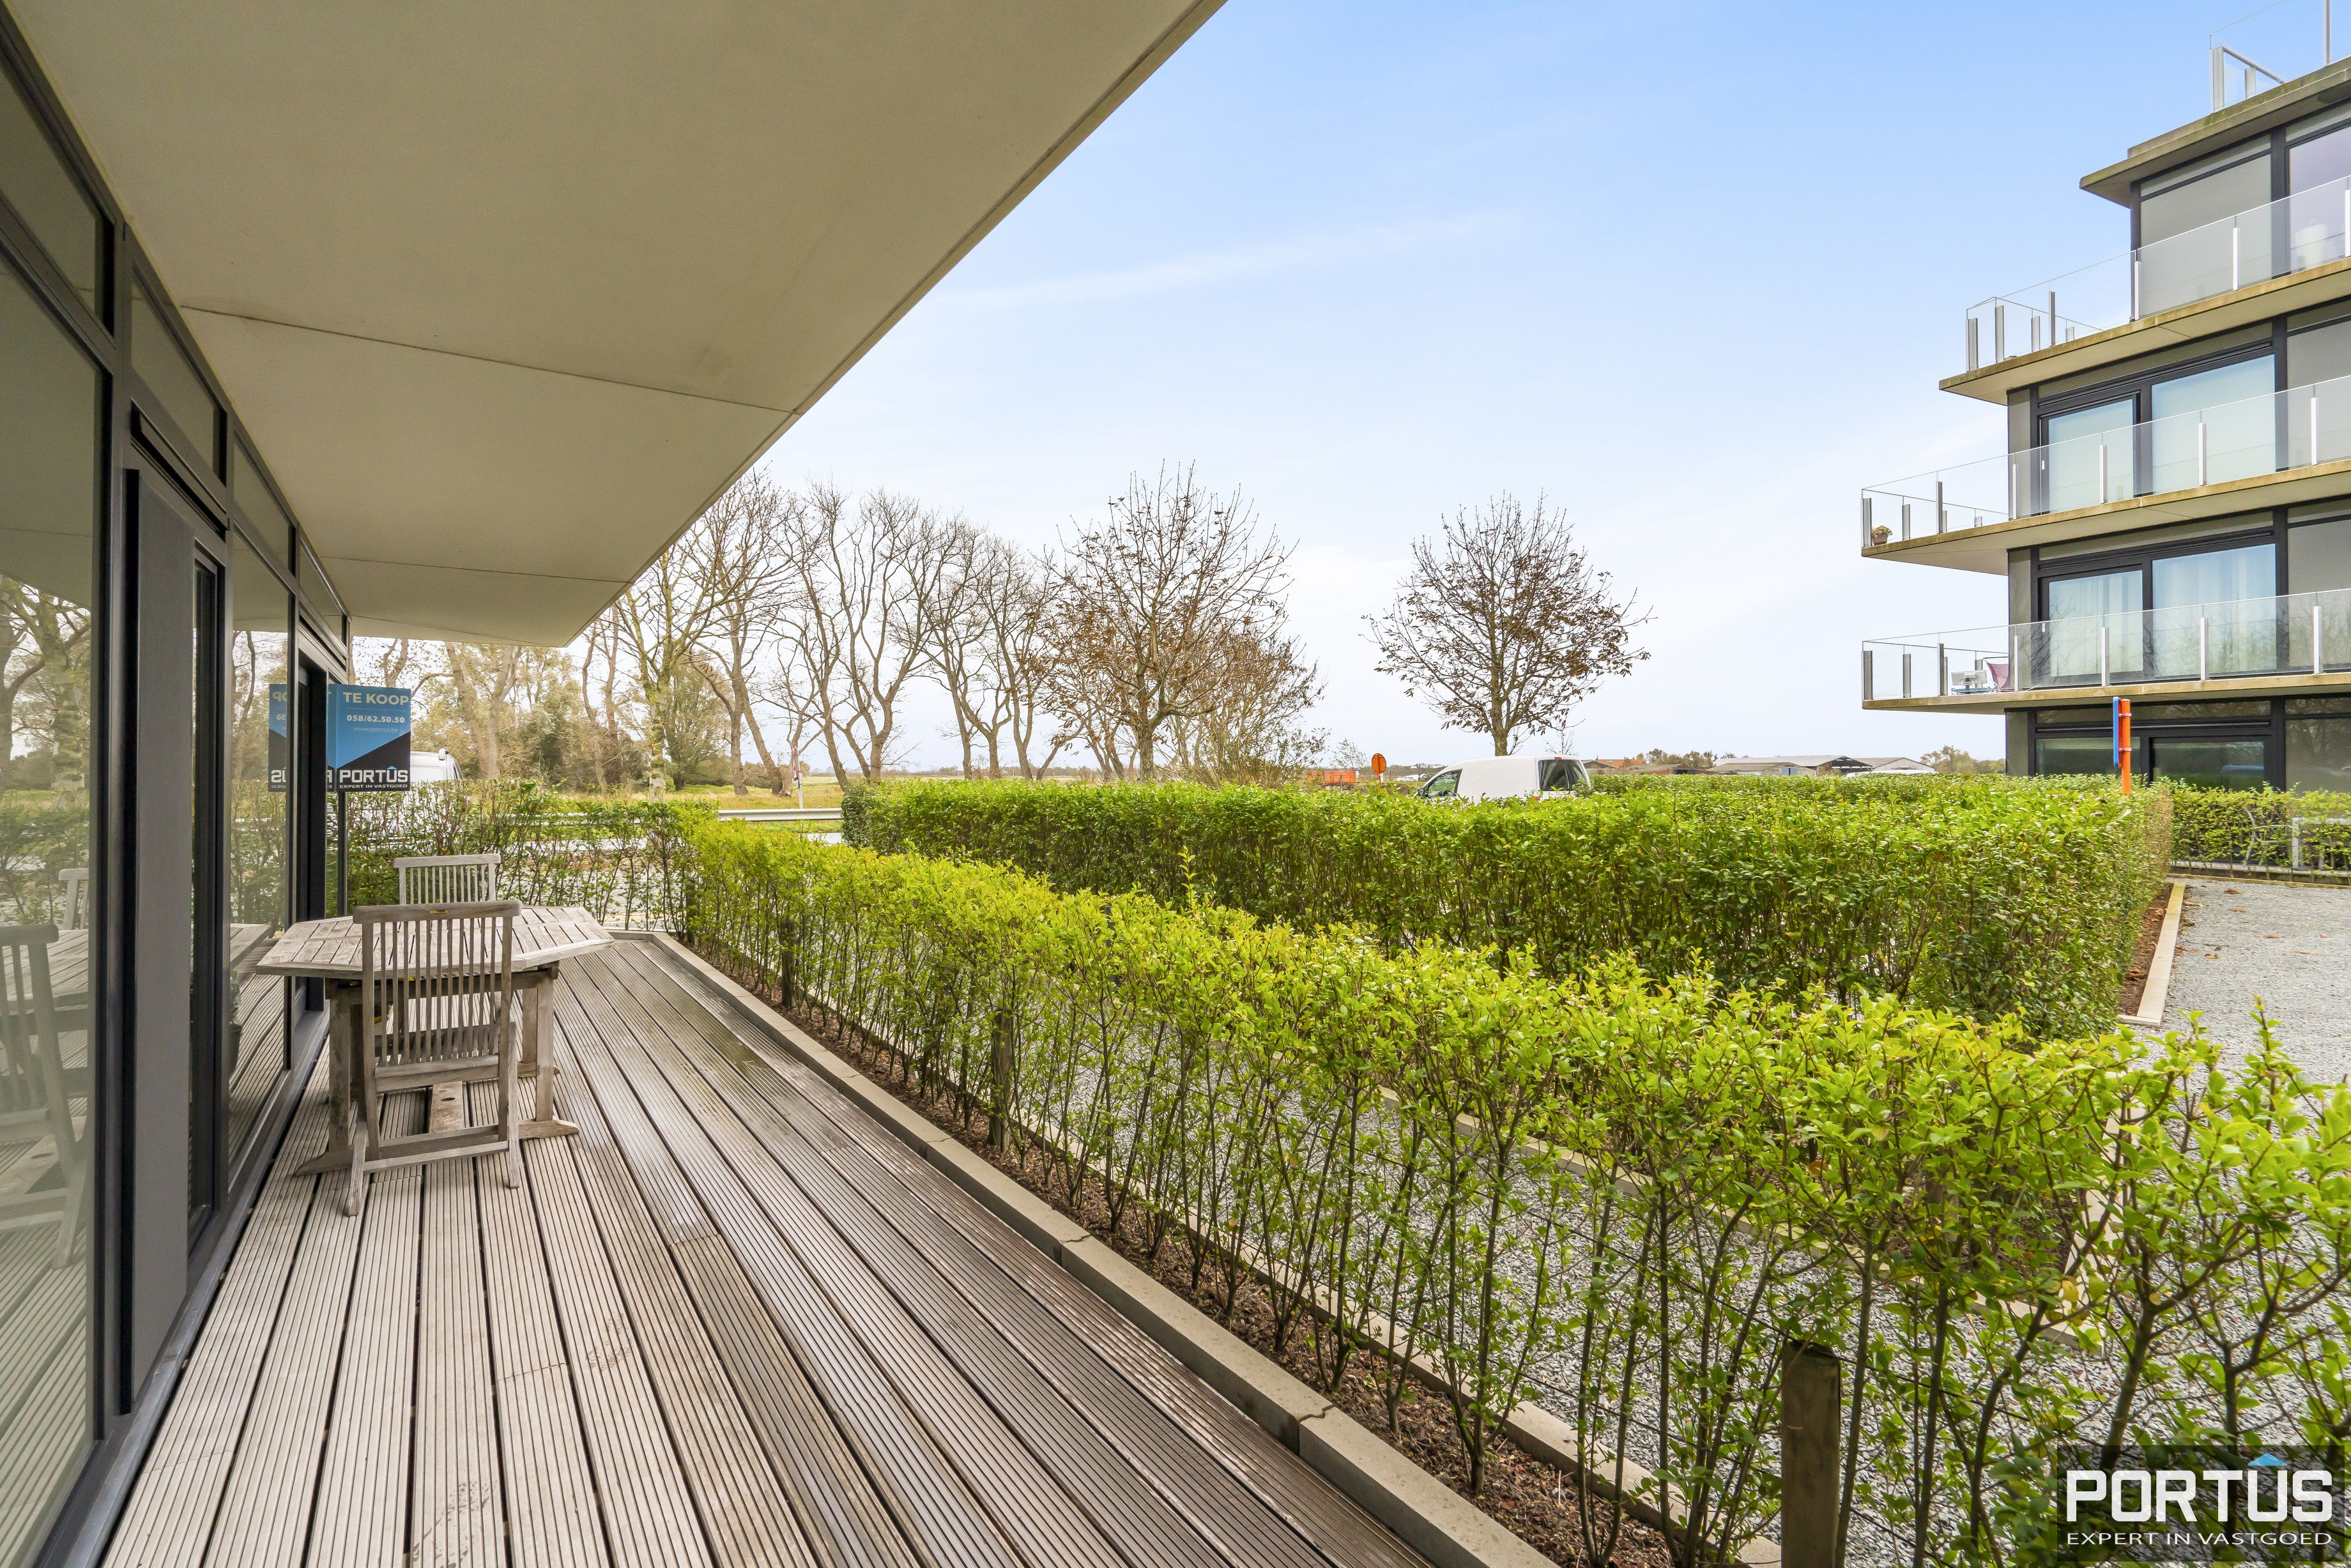 Appartement te koop met 2 slaapkamers in Residentie Waterfront te Nieuwpoort - 11870